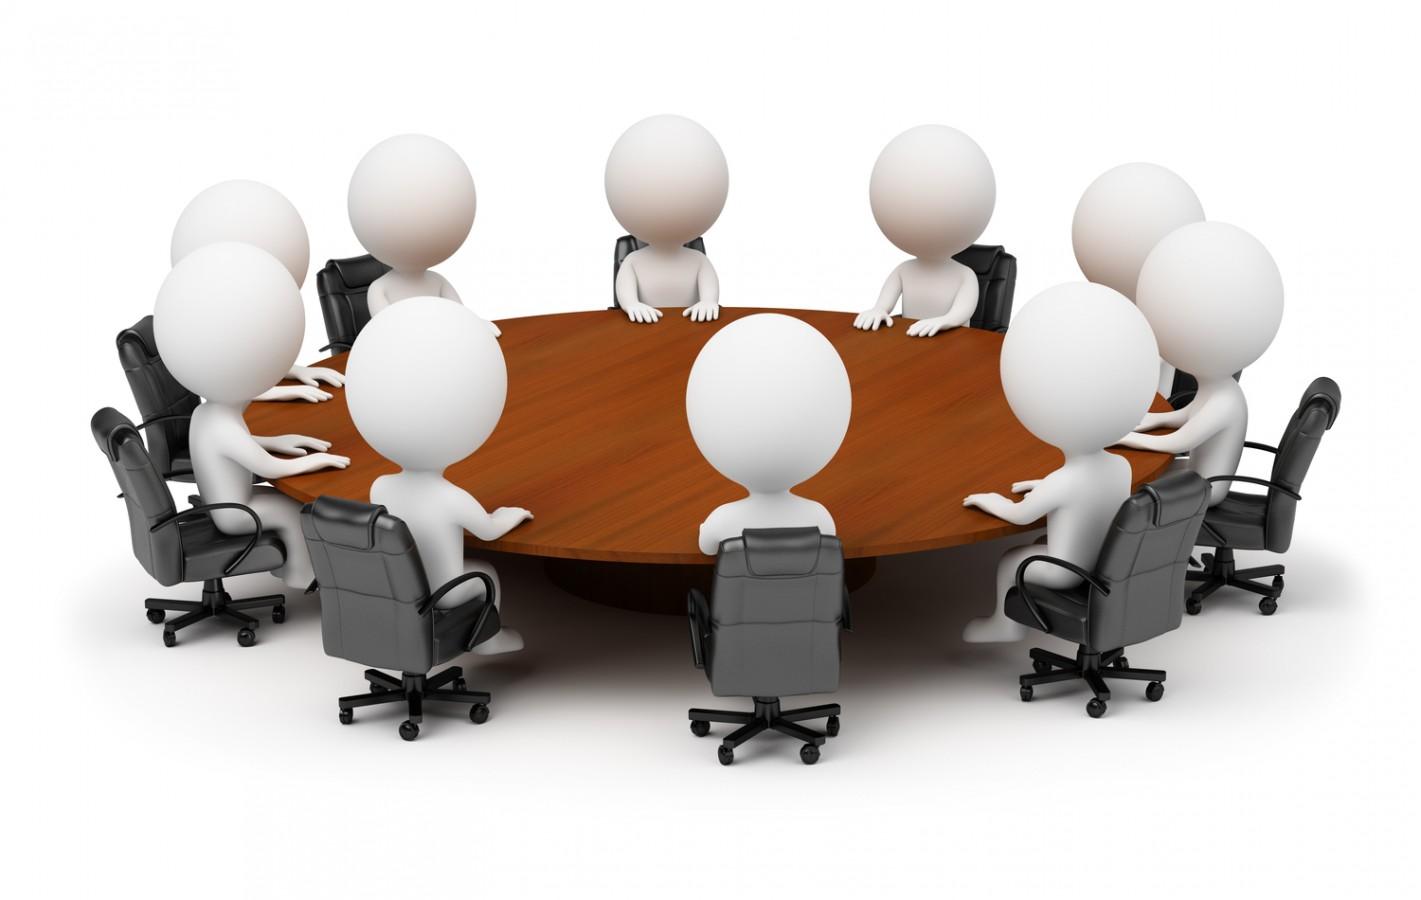 Incontro - Meeting - Riunione - Tavola rotonda Imc